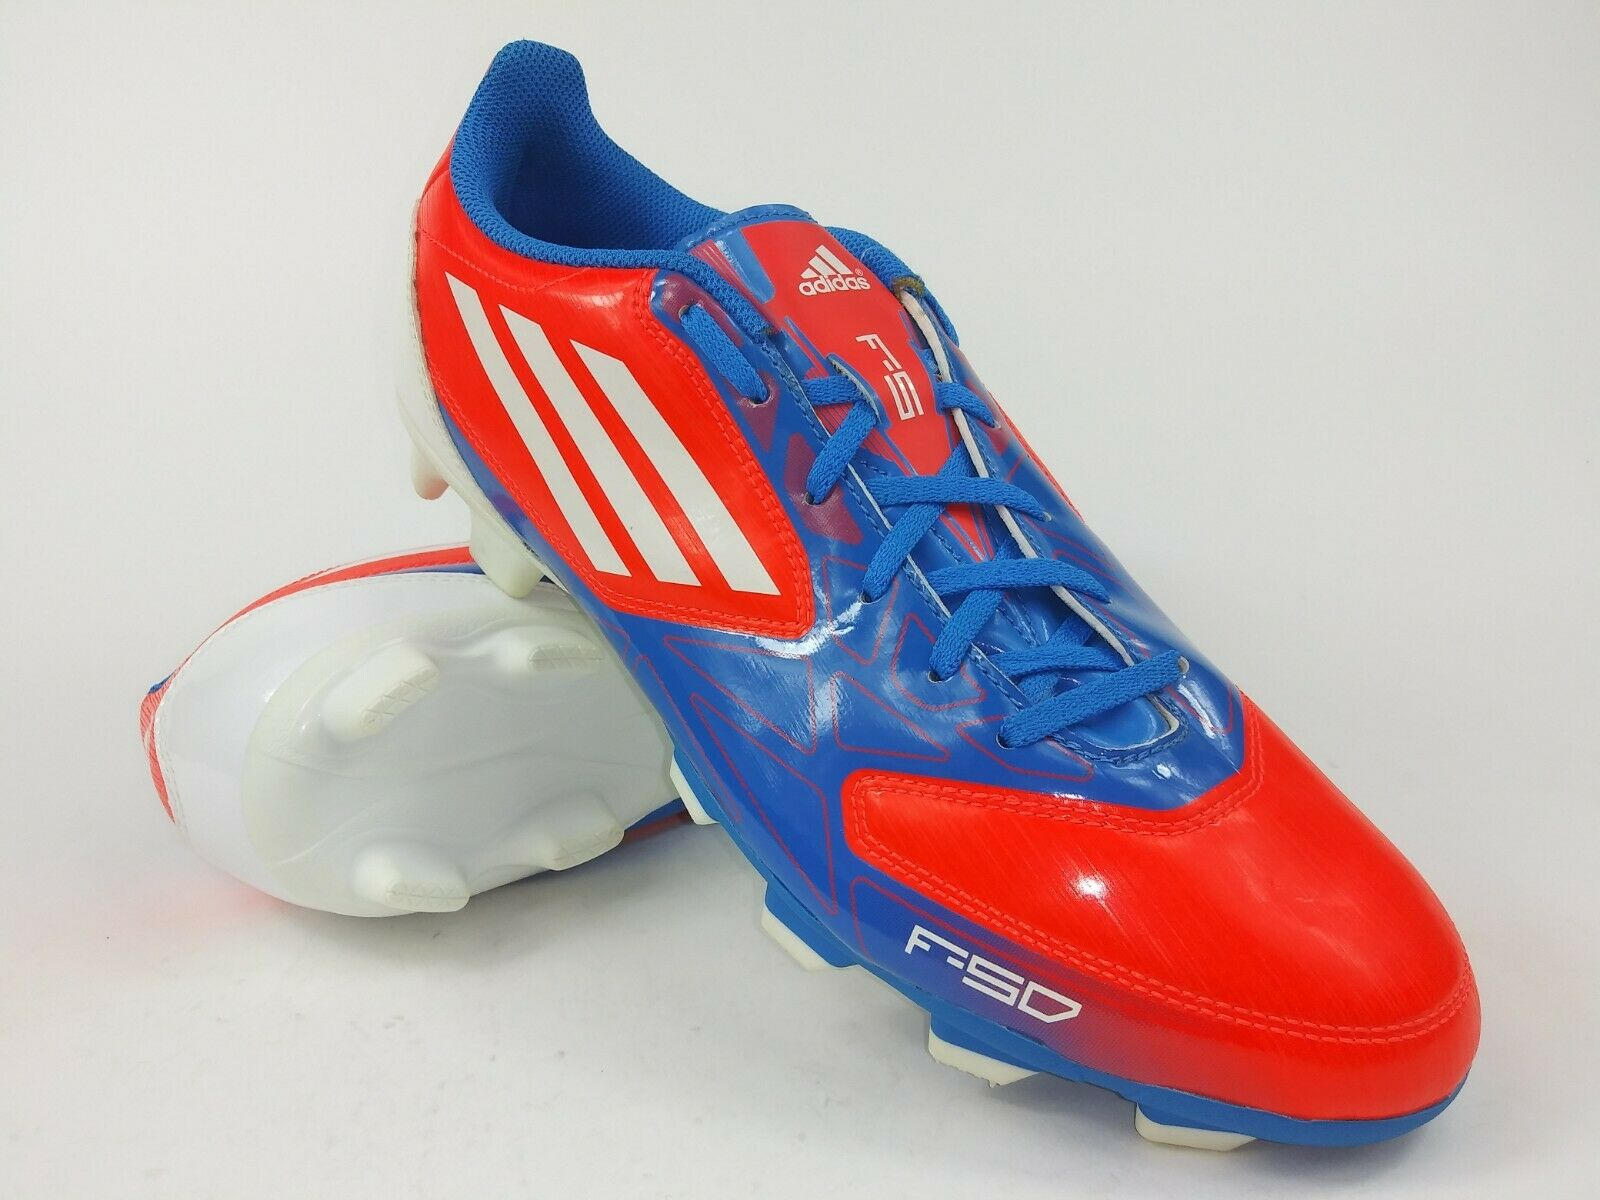 Adidas uomini Rare  F5 TRX FG V21455 arancia bianca Soccer Cleats stivali Diuominiione 10.5